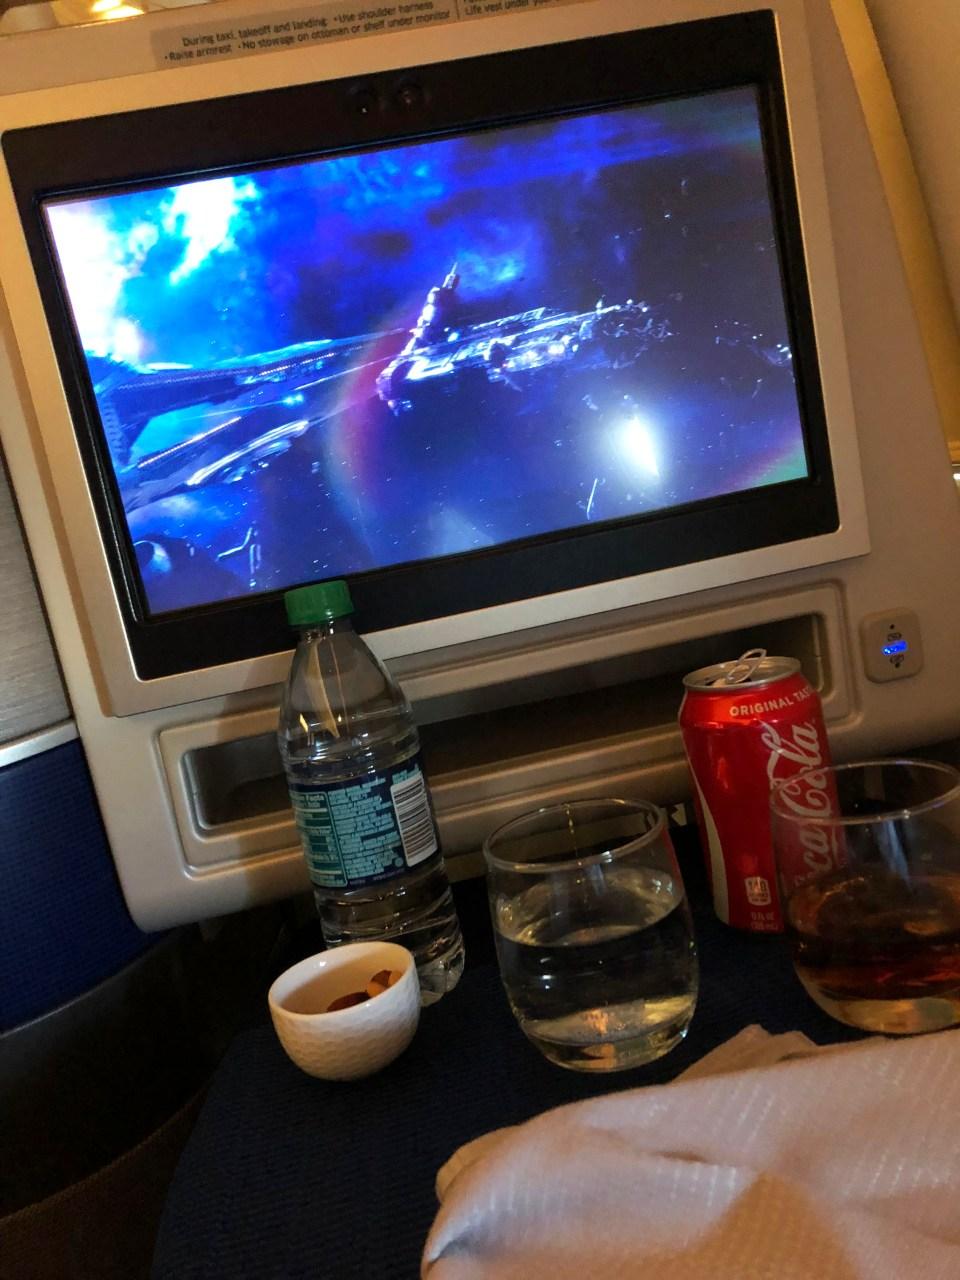 Plane movie